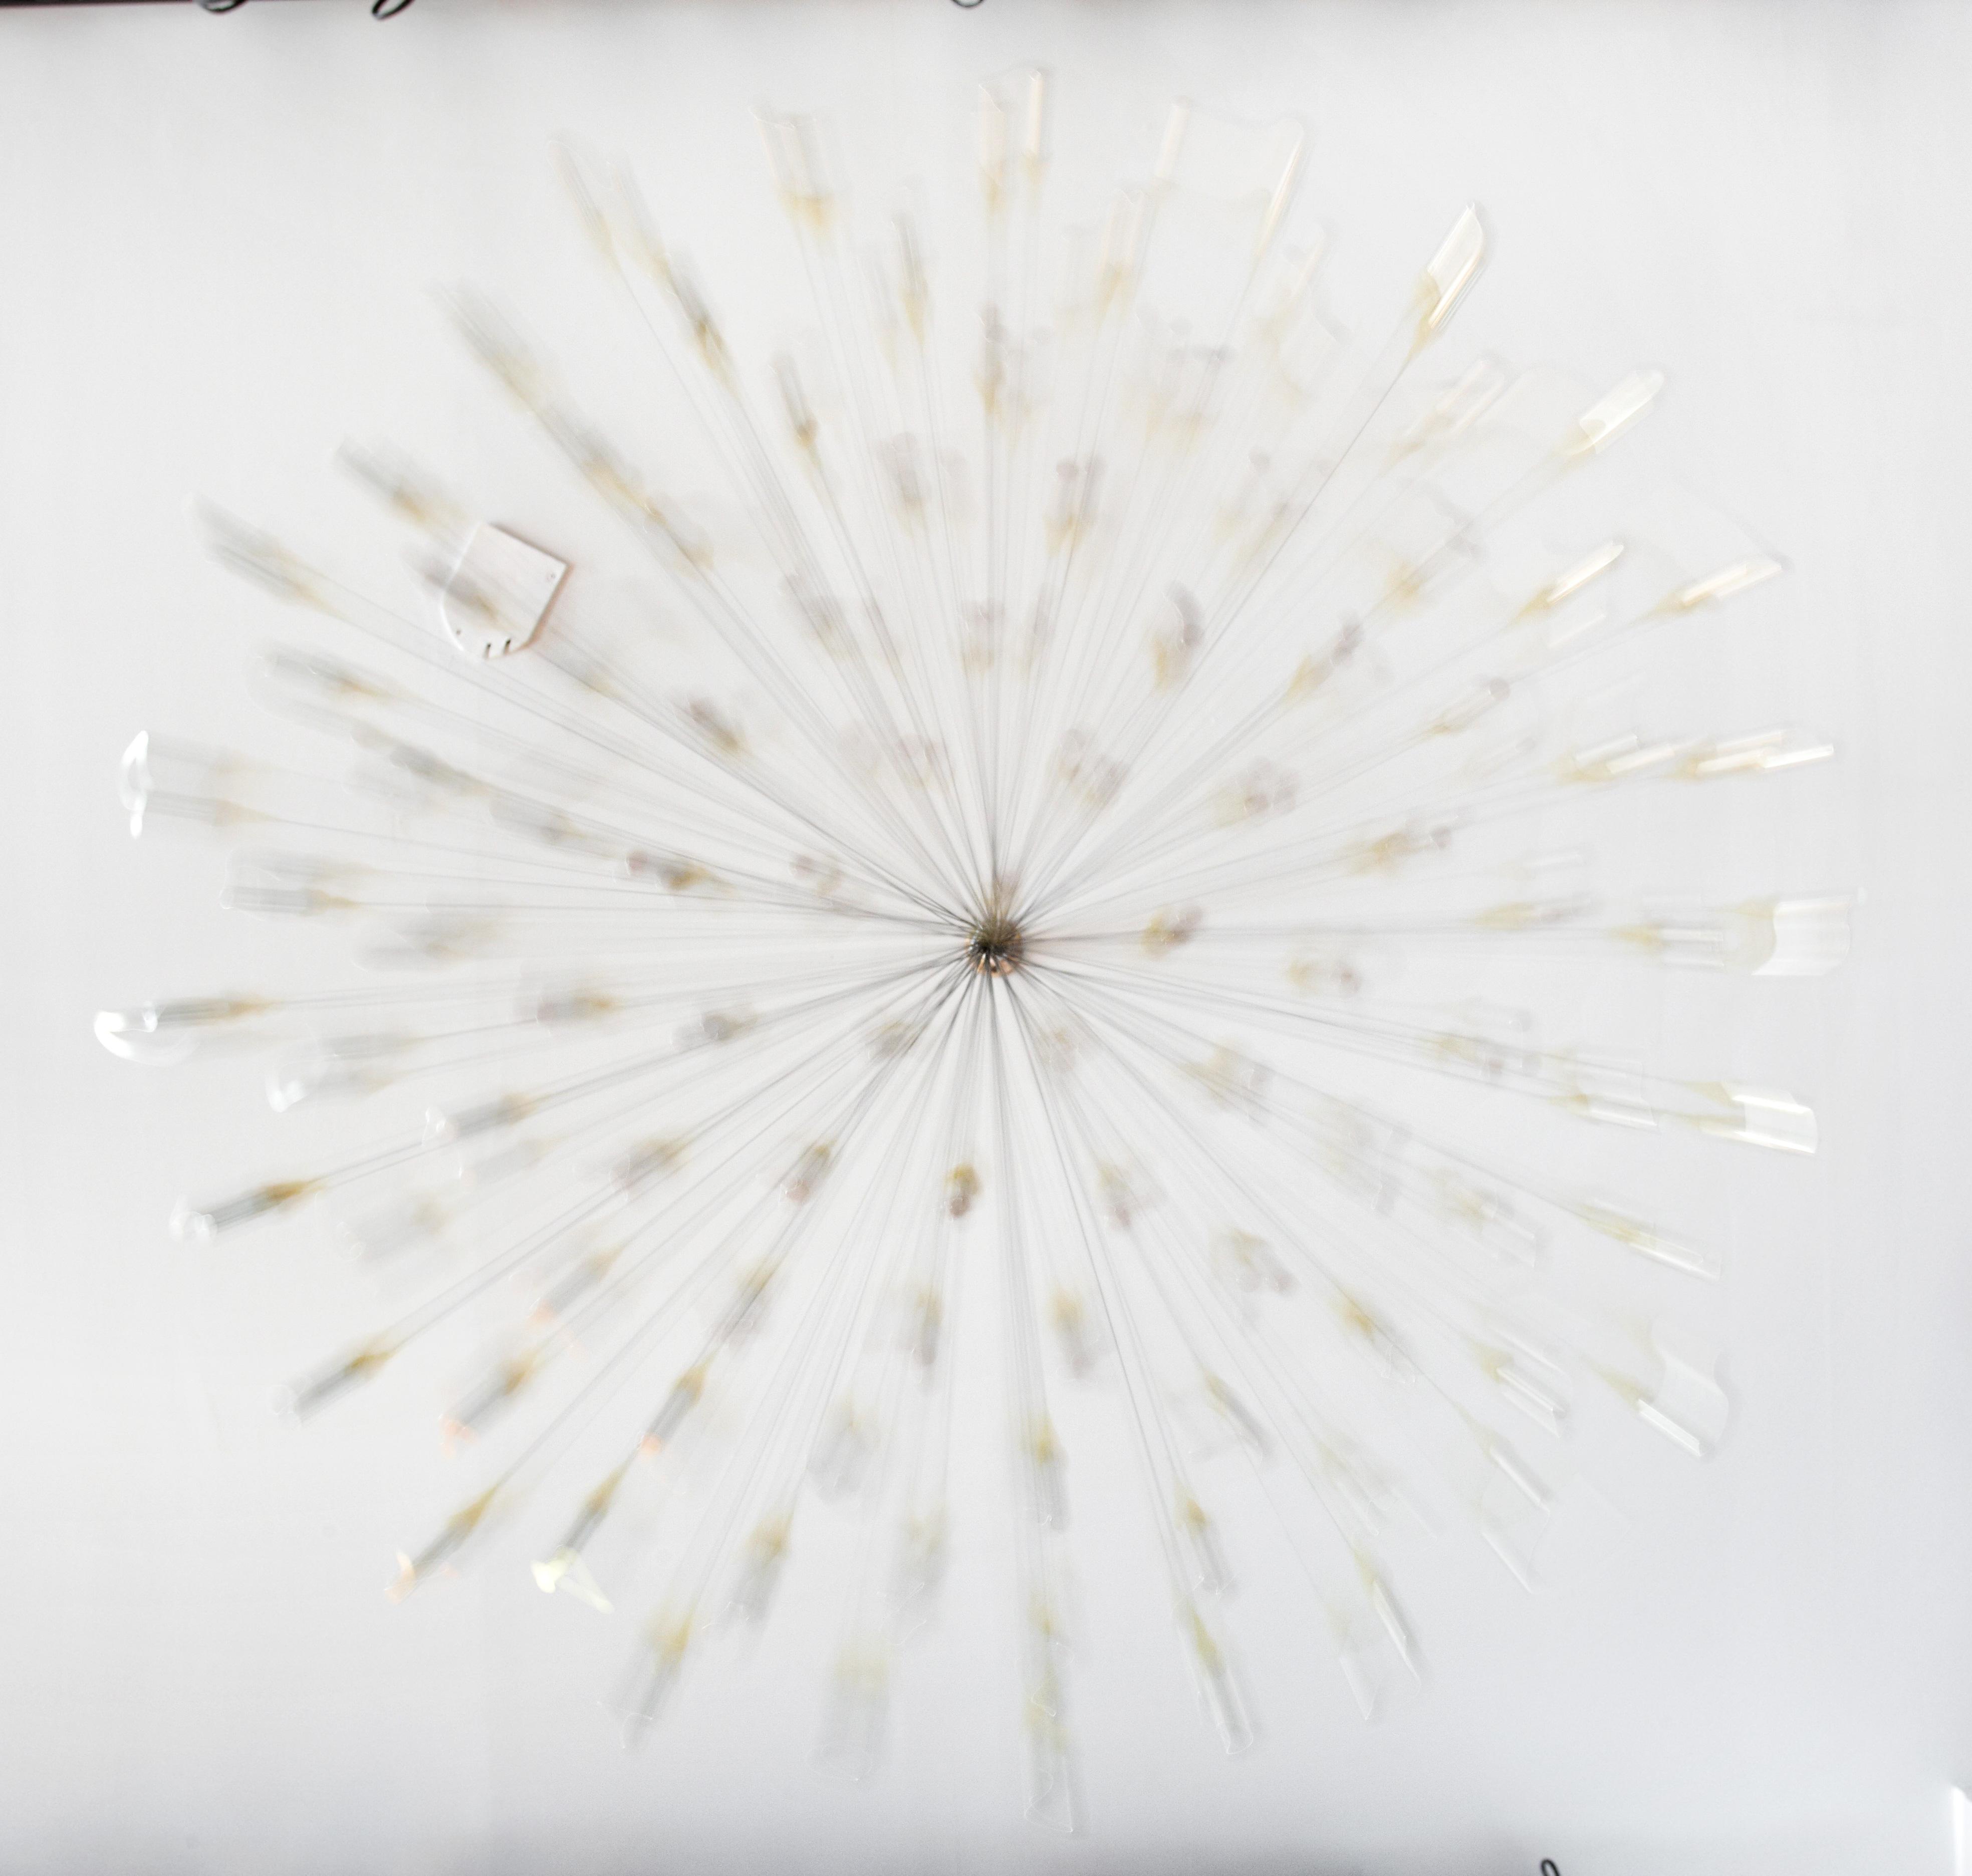 untitled (101 v.2), in motion, 2011